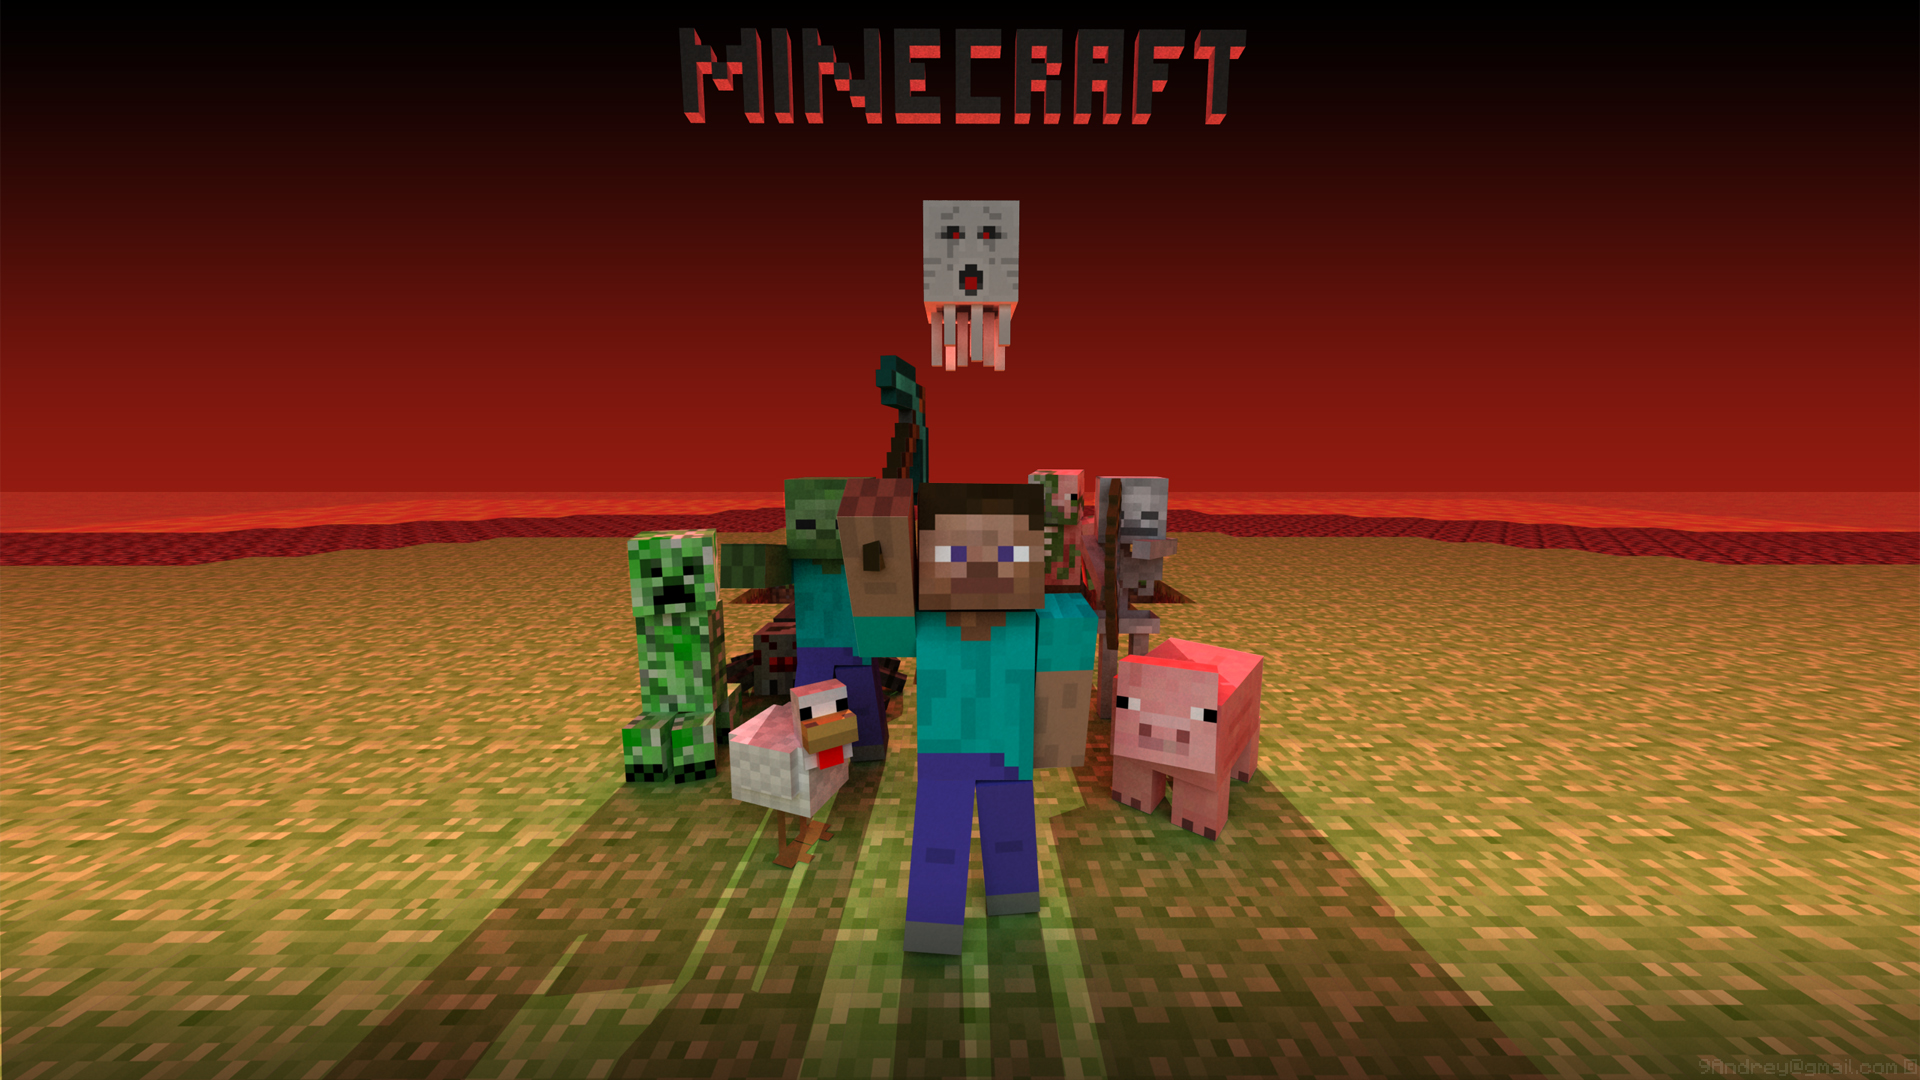 minecraft_wallpaper_1_by_andrey_s-d32xbih